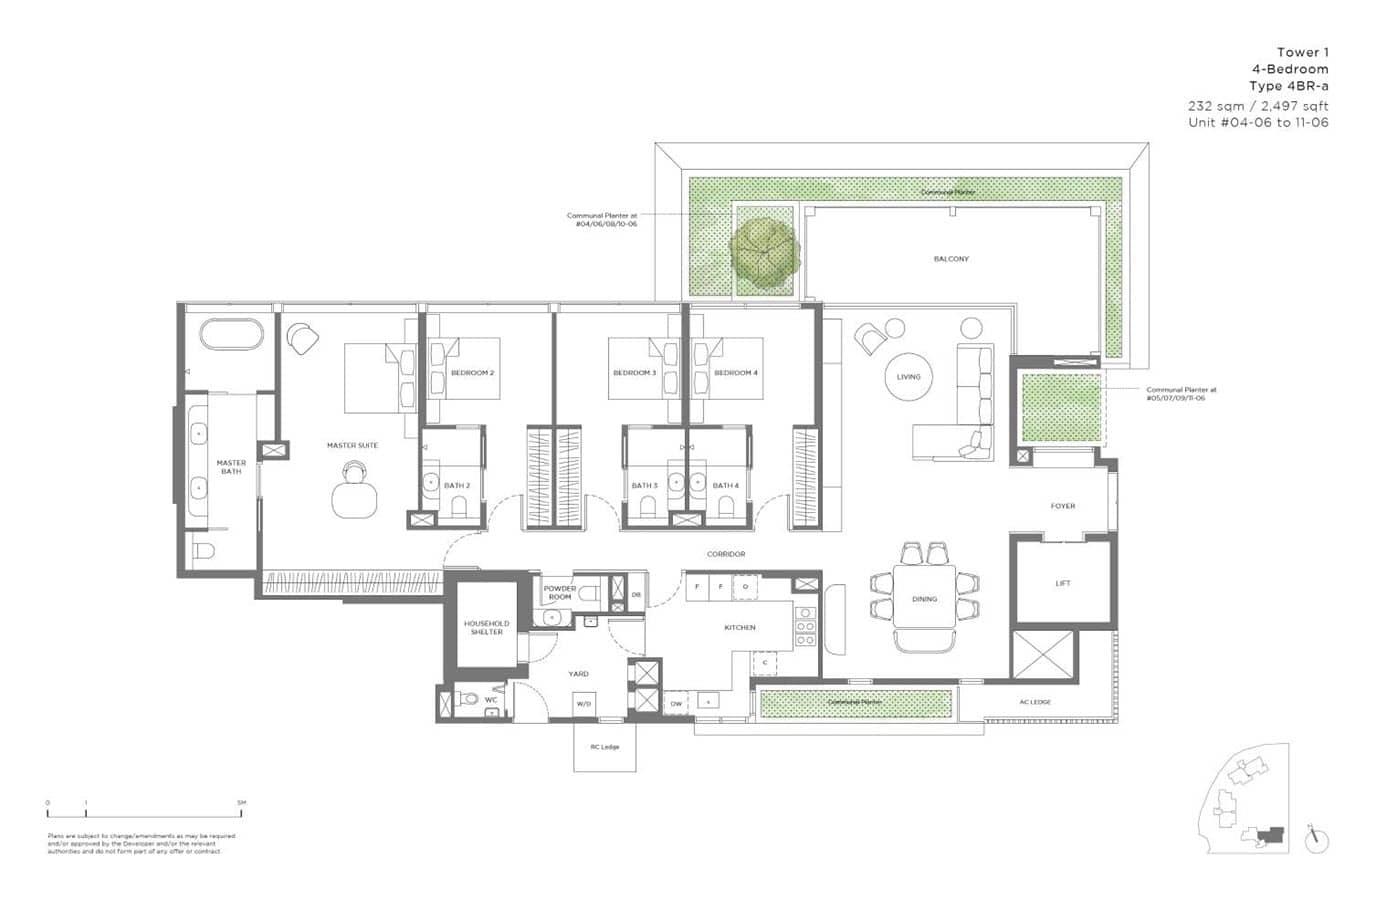 15 Holland Hill - Show Unit - 4 Bedroom 4BR-a